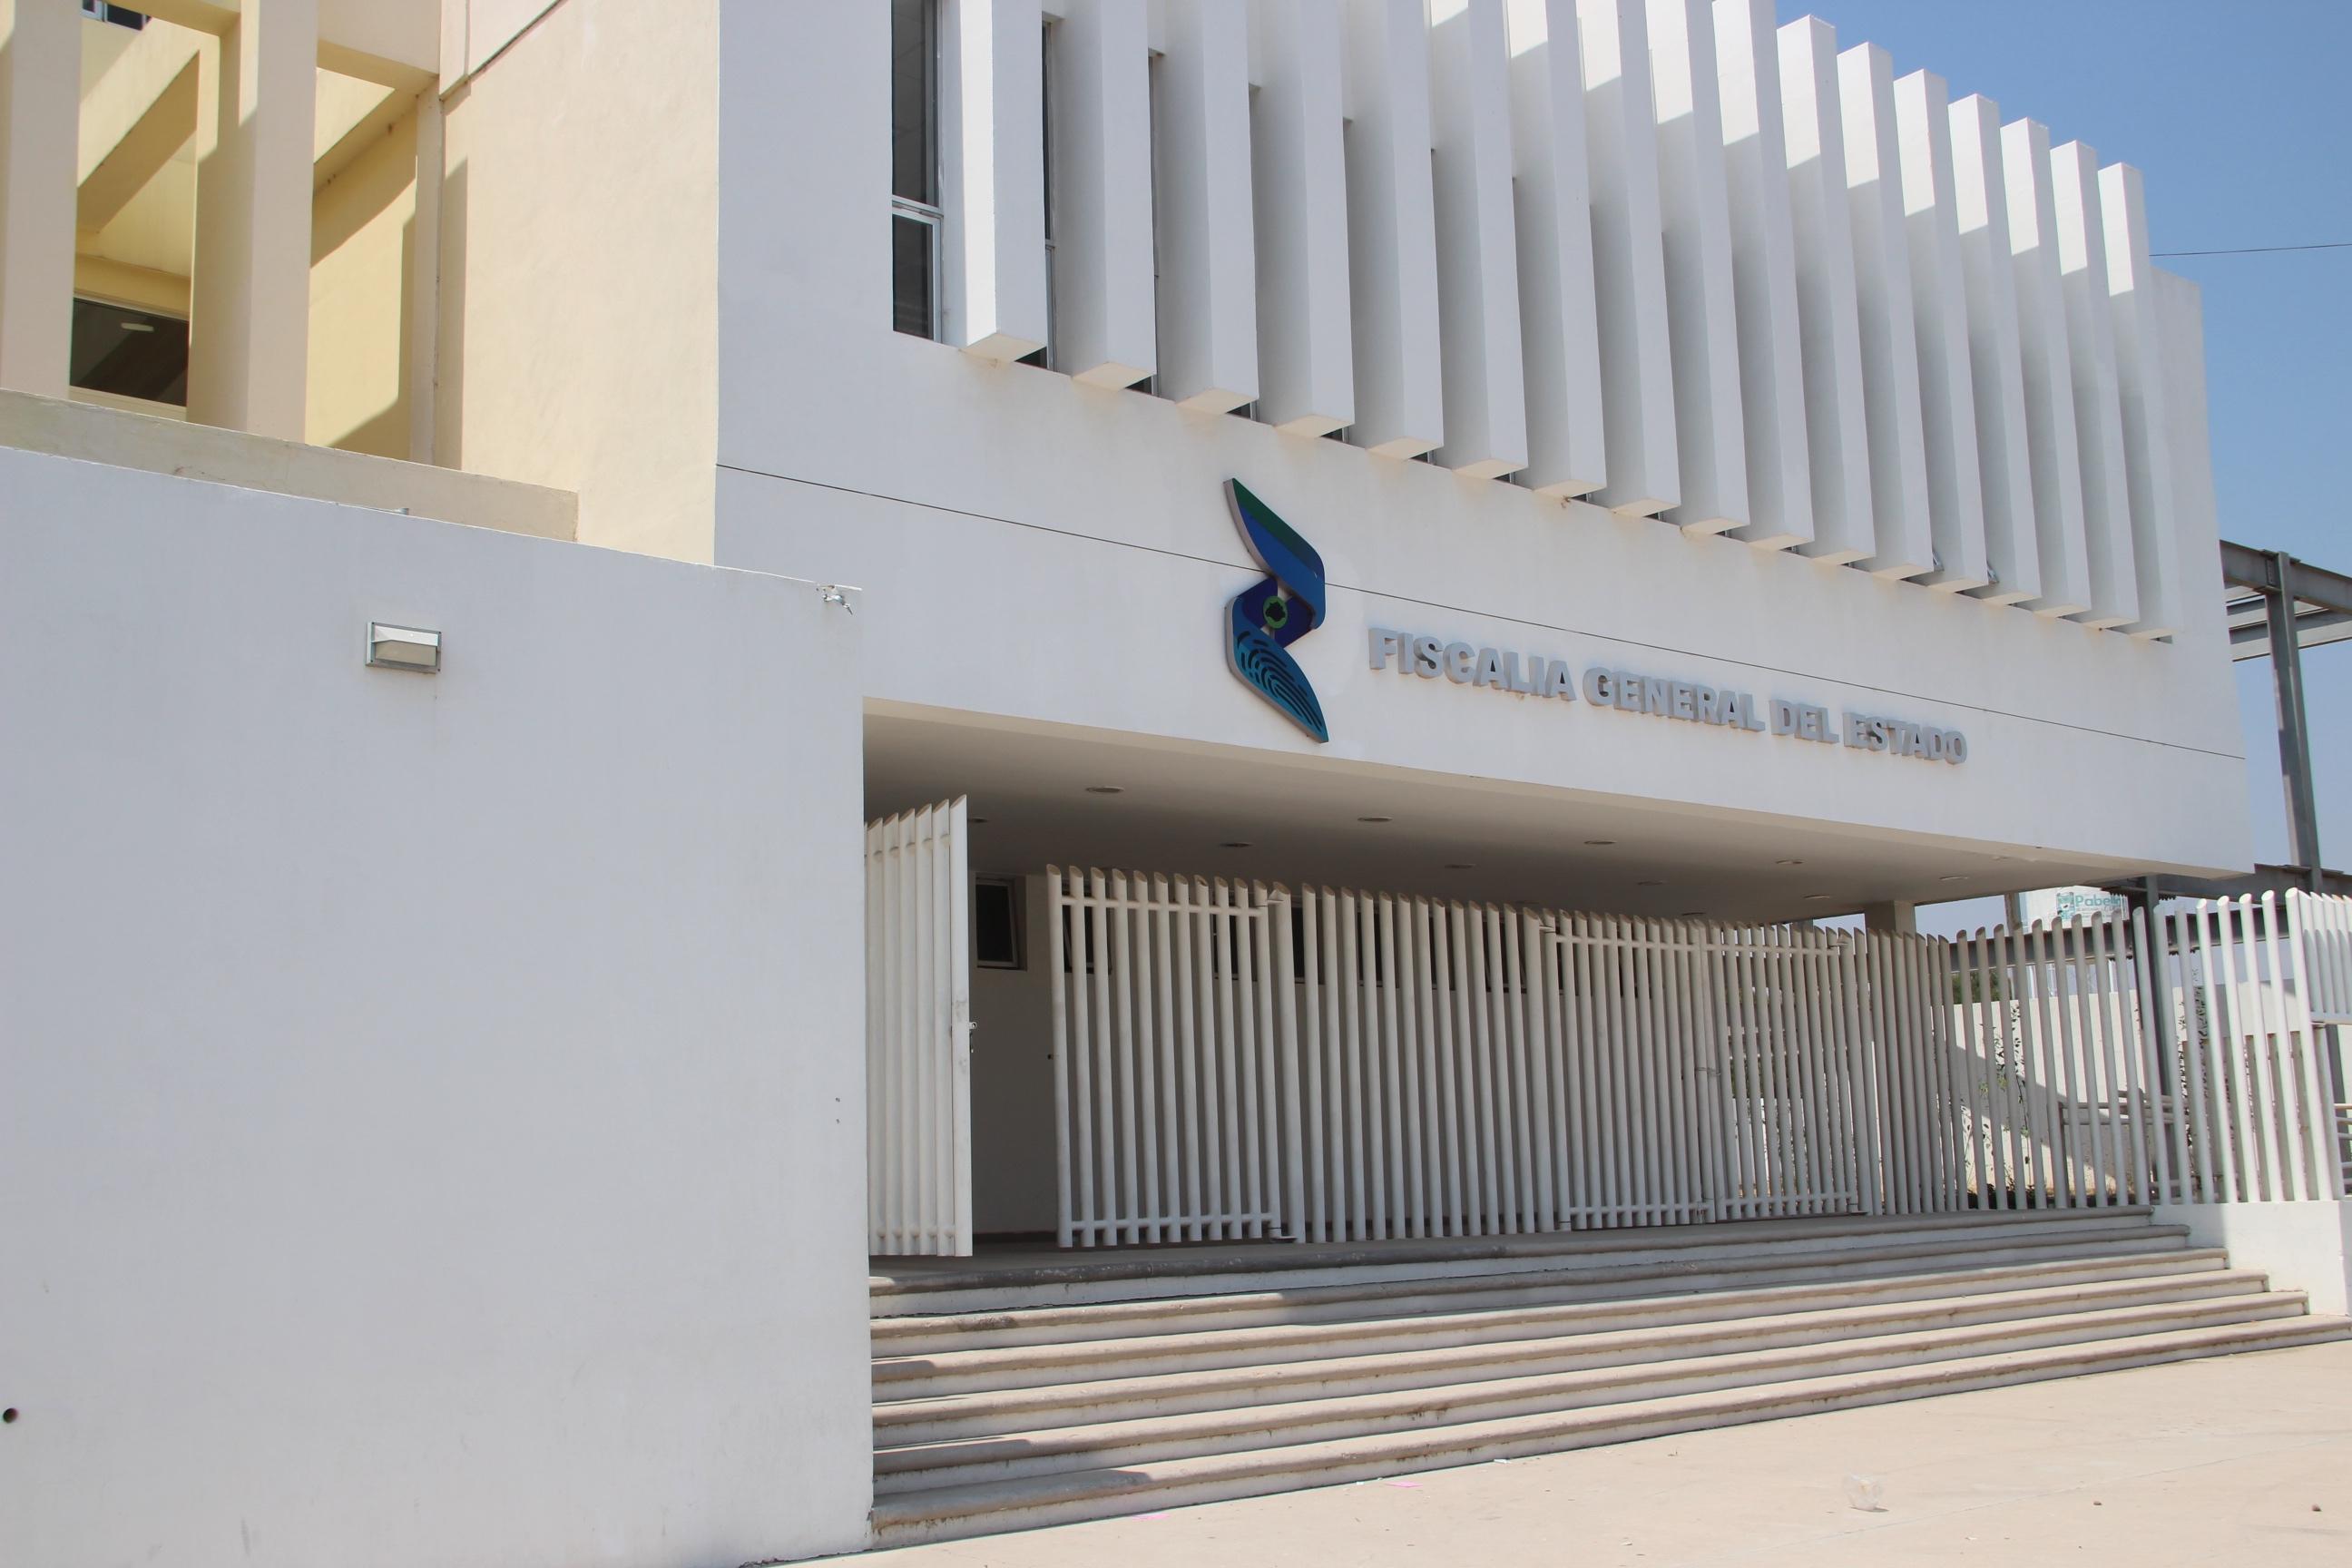 Reponen sentencias a homicidas de Aguascalientes